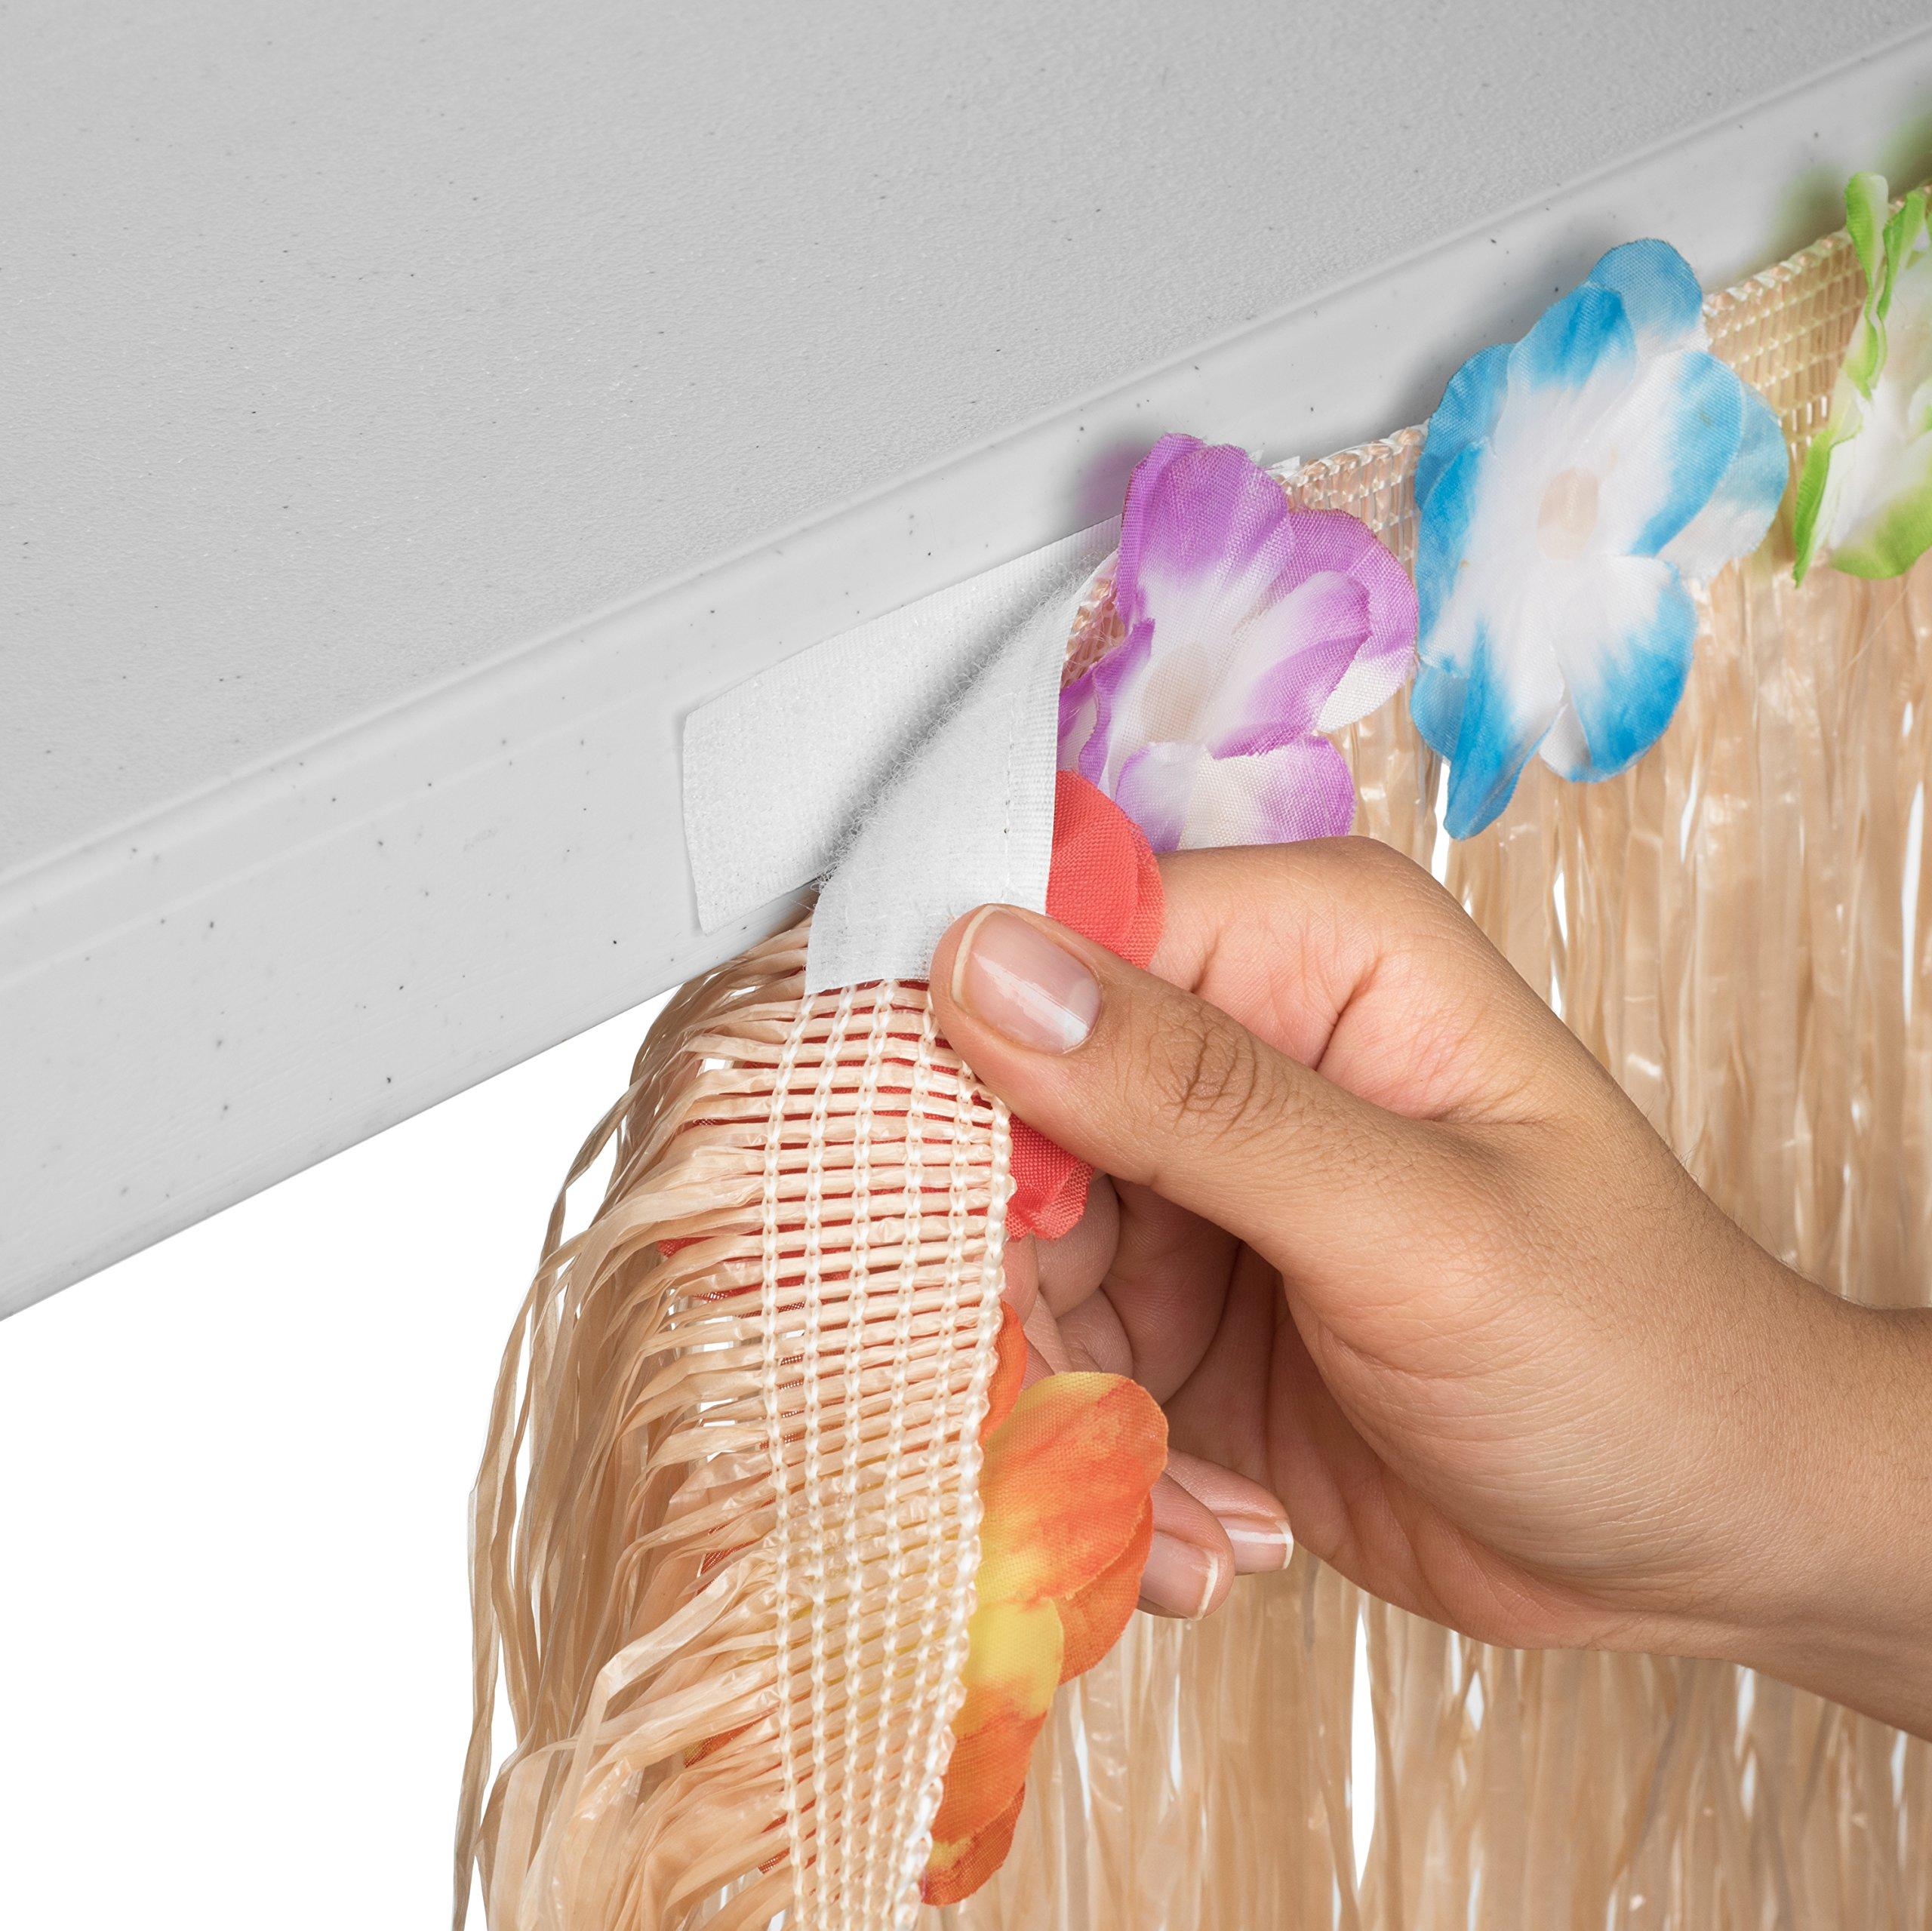 Hawaiian Luau Grass Table Skirt: BONUS 12 Hibiscus Flowers | Includes Adhesive | Perfect Beach, Tiki, Tropical, Island, Party, Luau Decoration 9ft by Luau Essentials (Image #4)